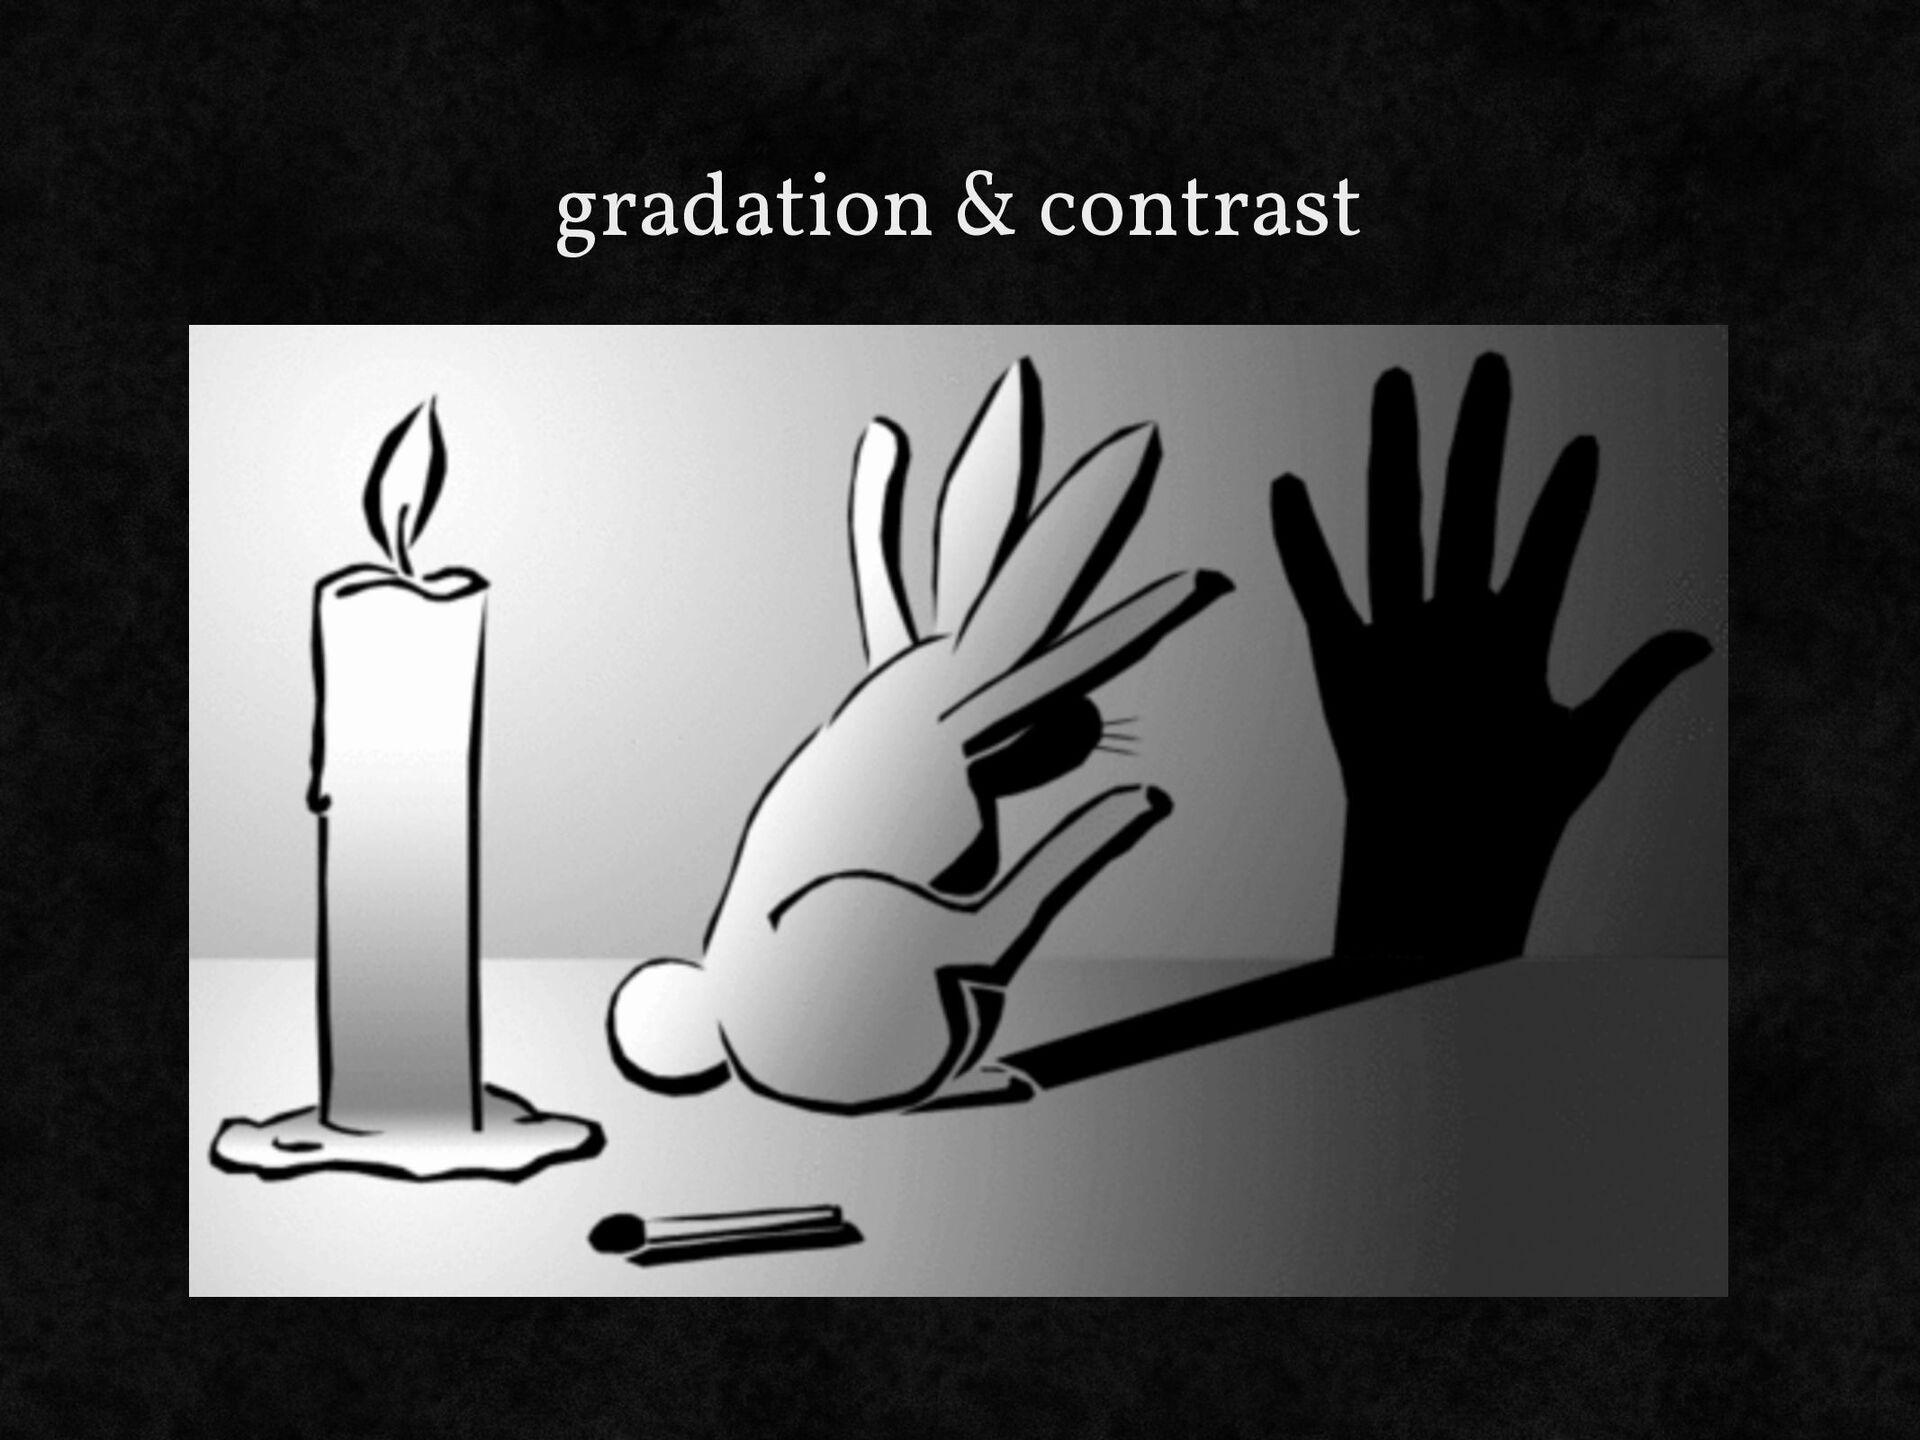 gradation & contrast